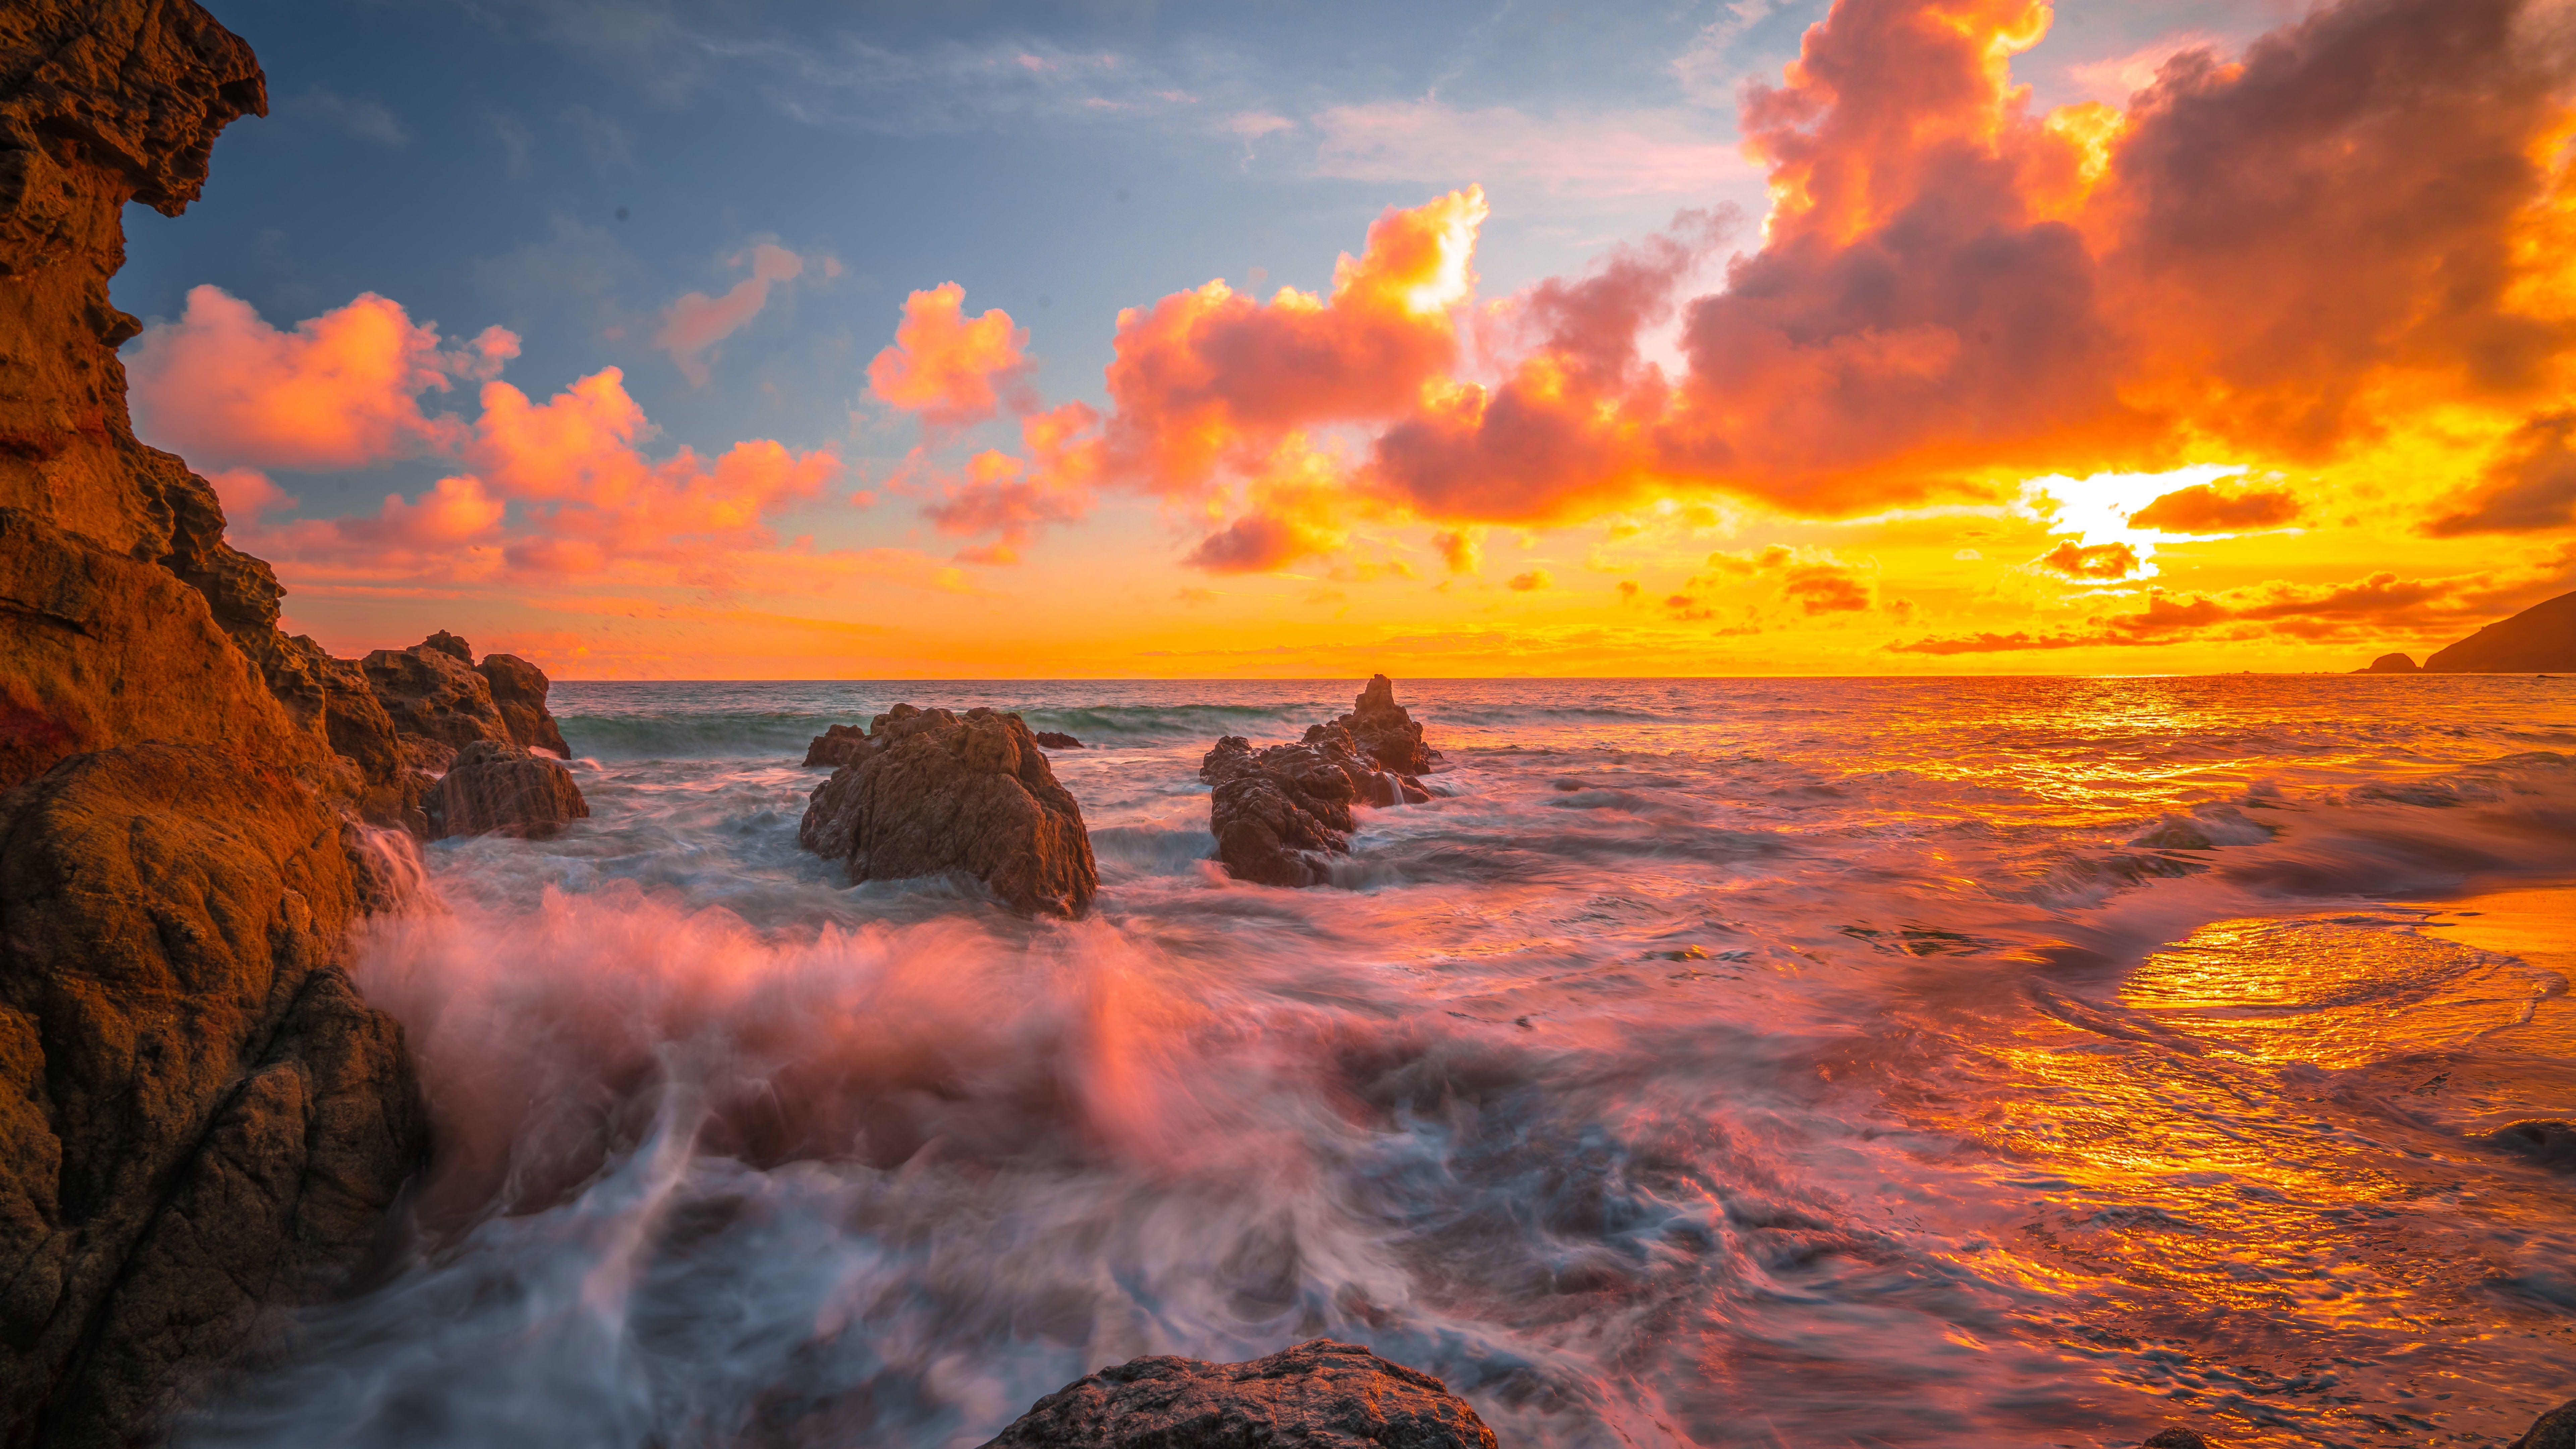 Sea Shore Orange Sky Ocean Horizon Sunset Rock Coast Wave 8k Uhd Afterglow Evening 8k Wallpap Nature Photography Background Orange Sky Hd Wallpaper